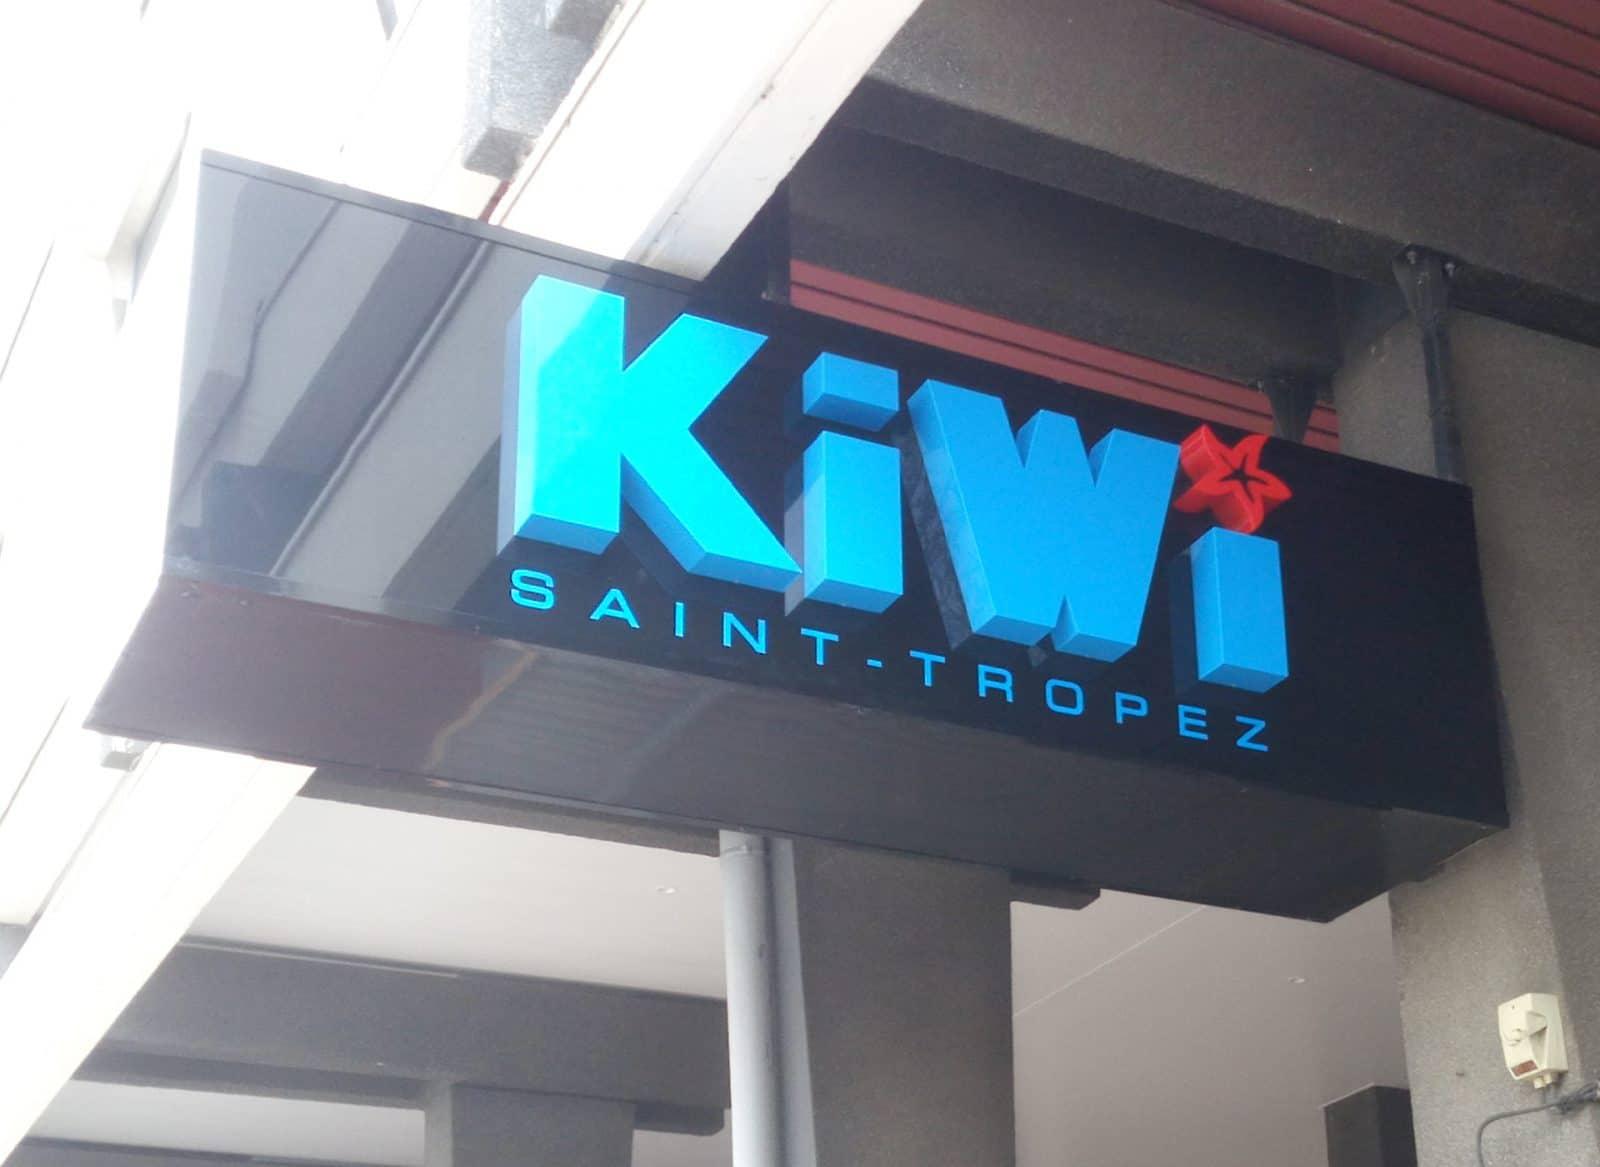 Kiwi - Saint-Tropez